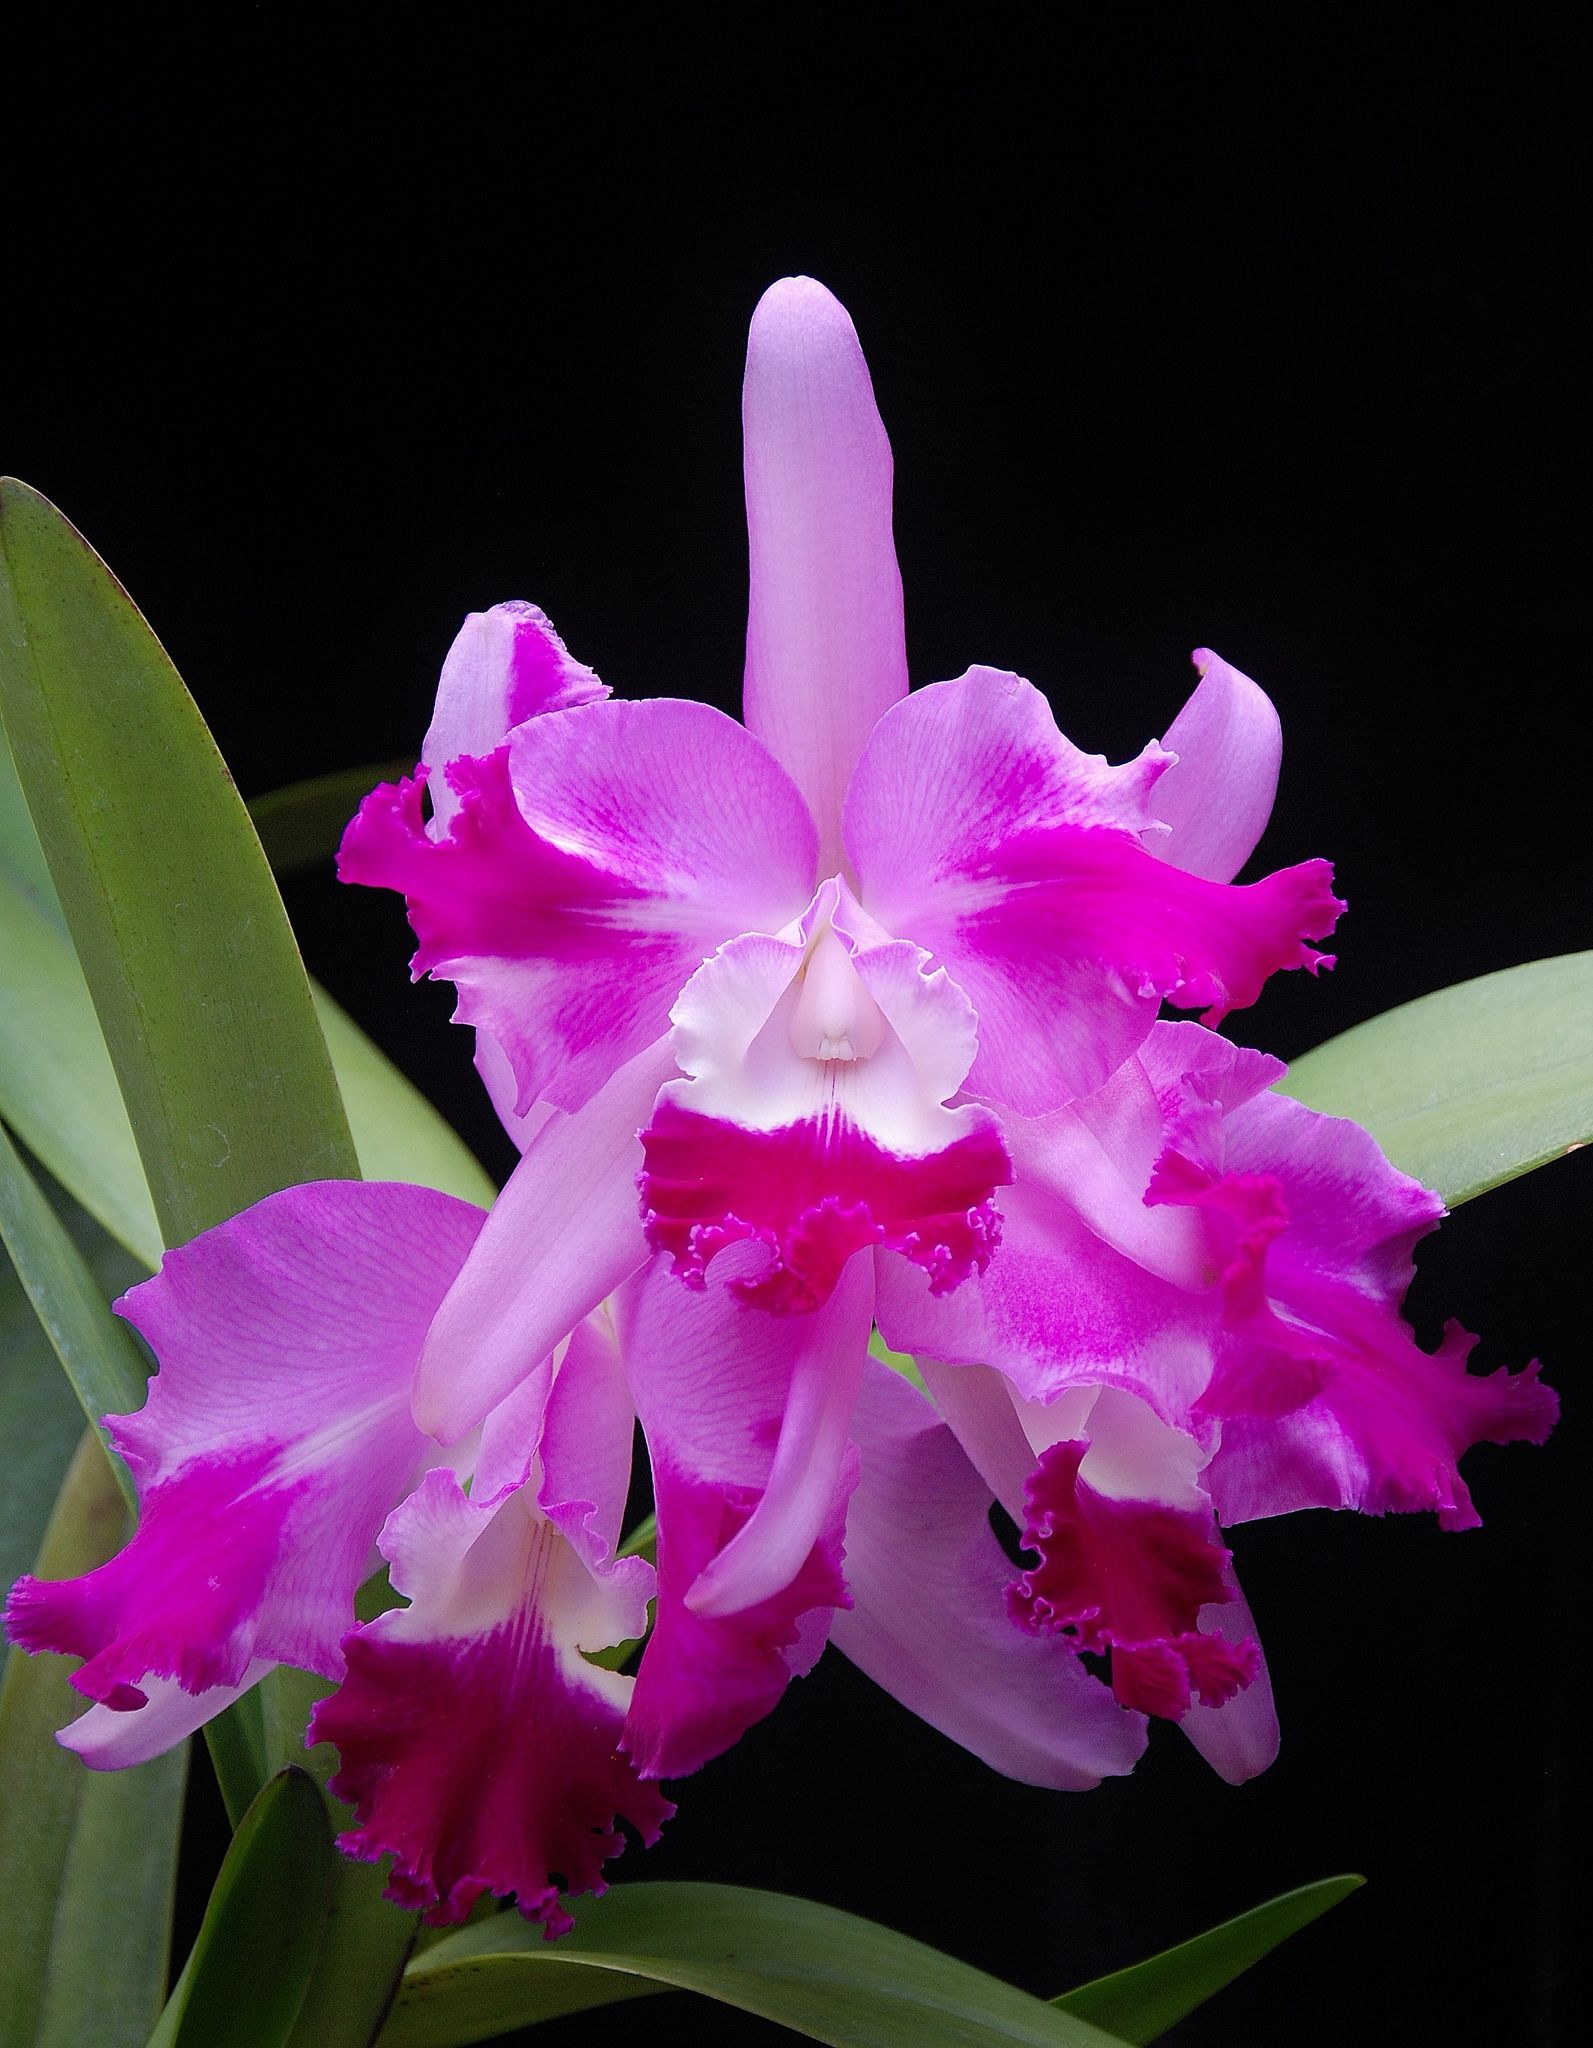 Cattleya Suavior Aquinii Fcc Rhs Cattleya Beautiful Orchids Orchids